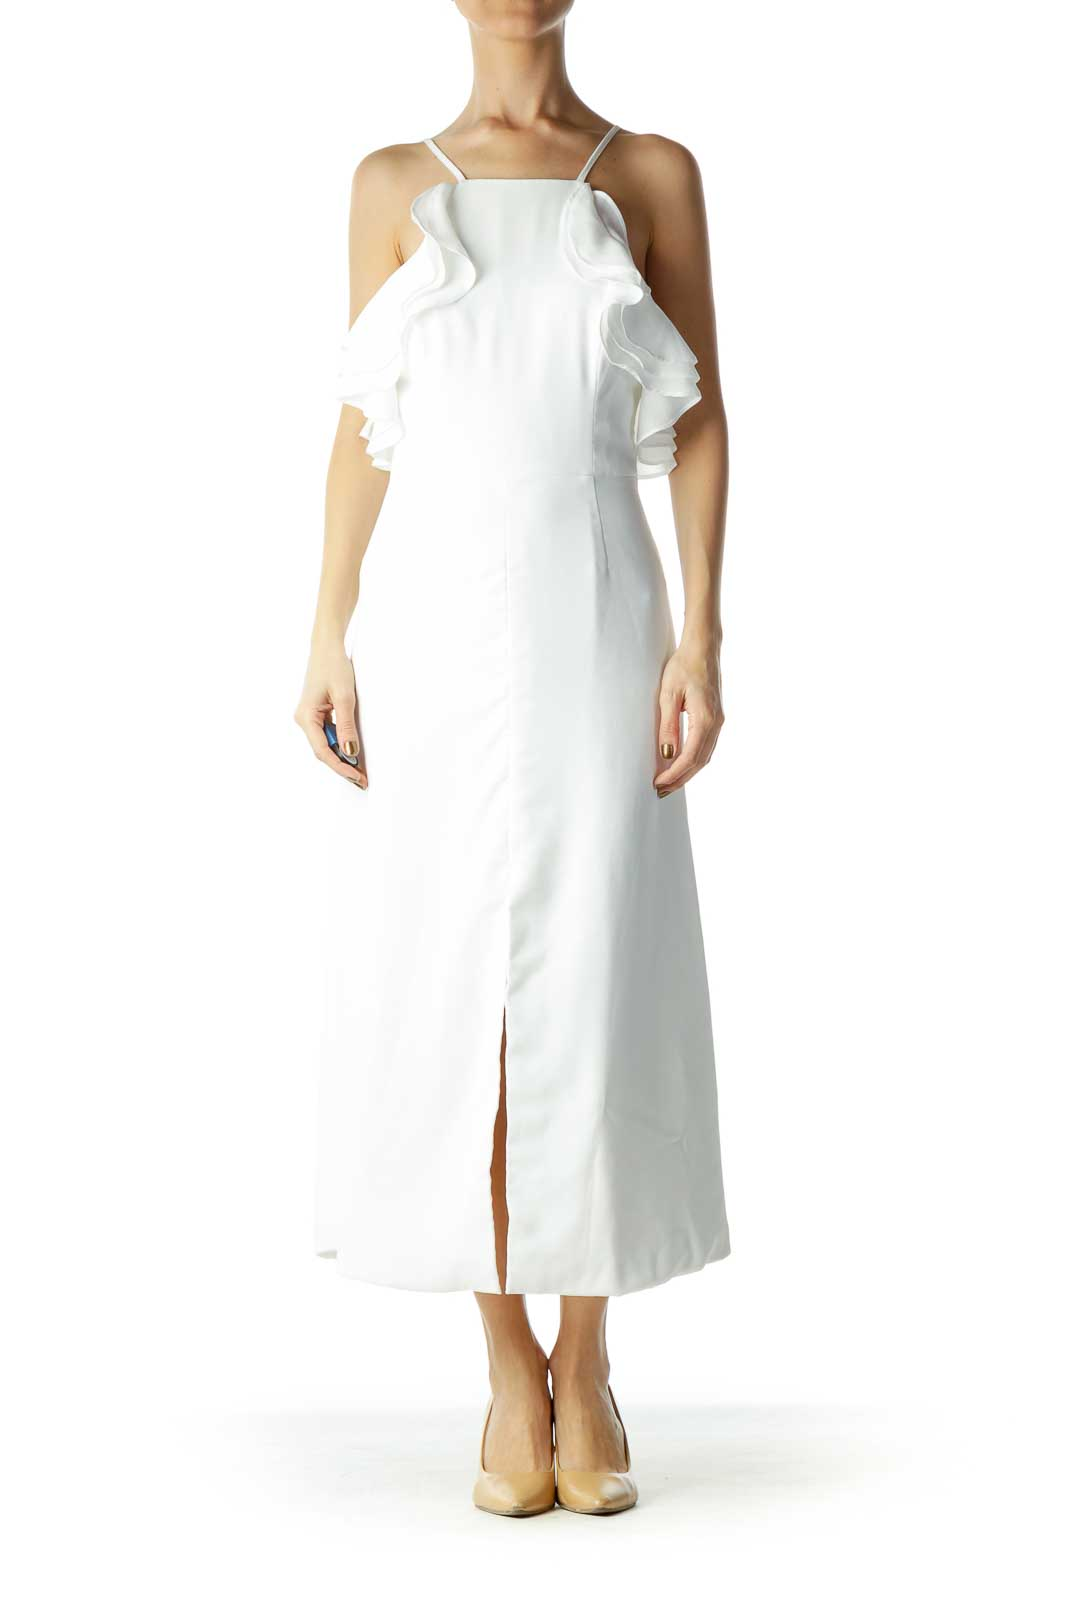 White Spaghetti Strap Ruffle Dress with Slit Front